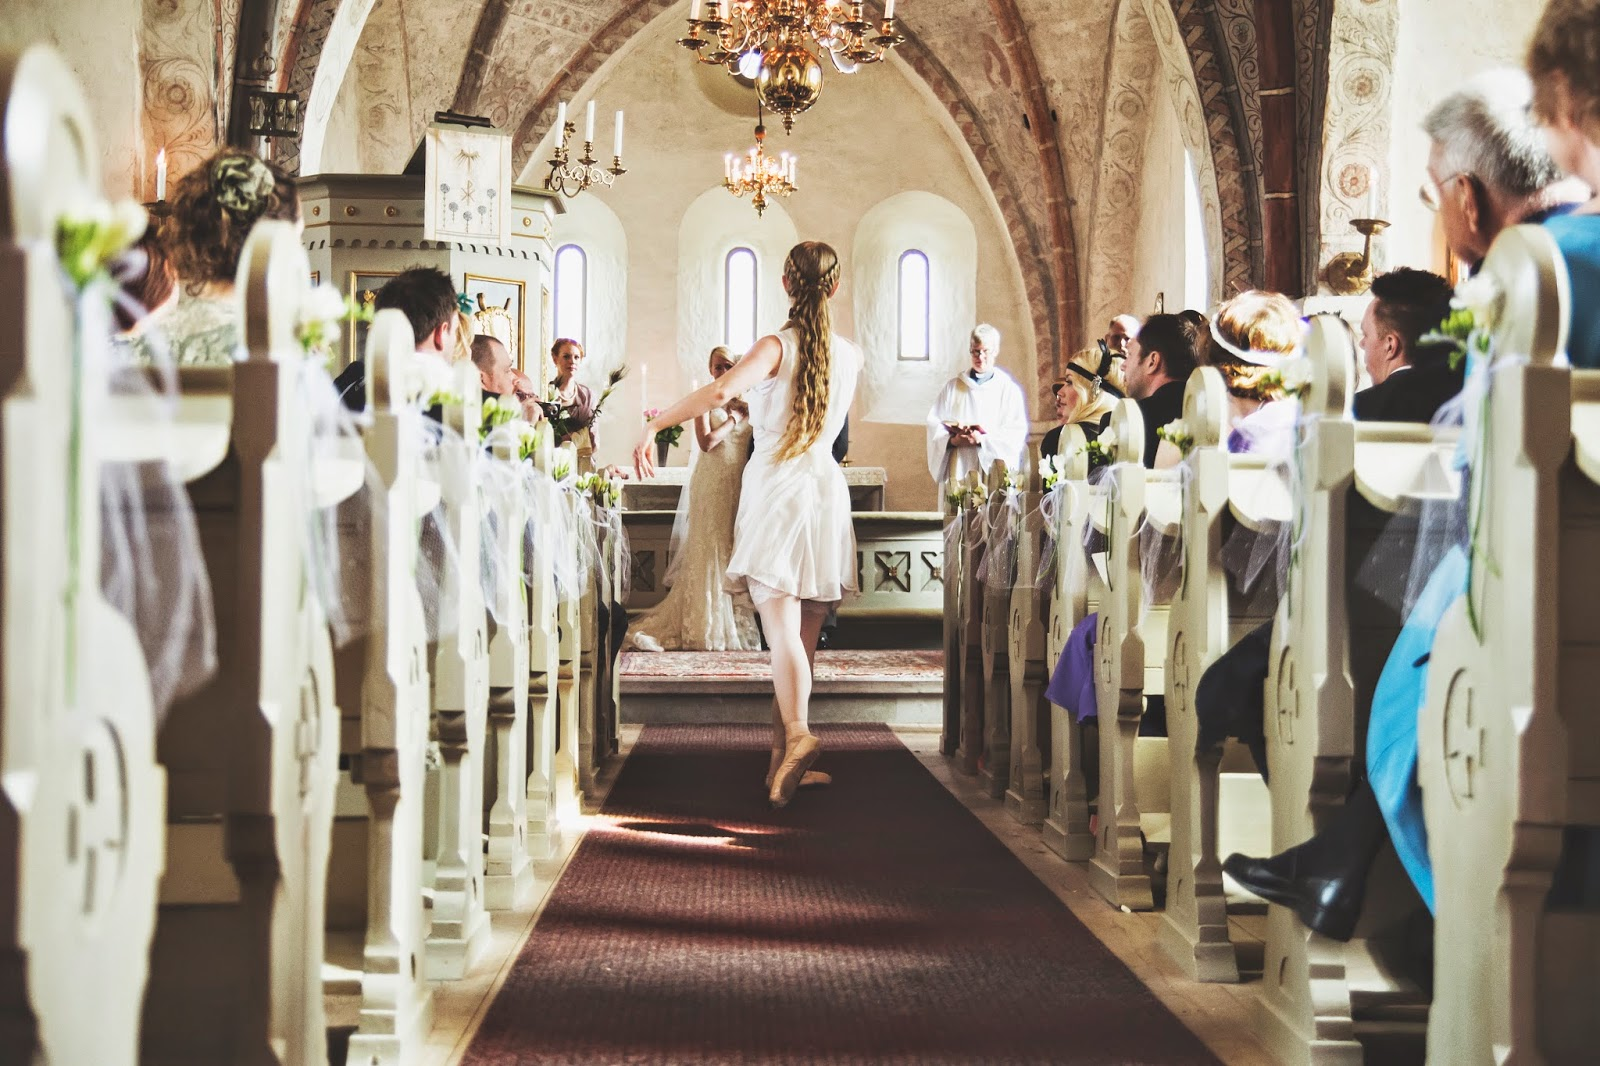 bröllop, brud, brudgum, wedding, fotograf, photographer, weddingphotographer, ruin, ballerina, balett, dansare, dansös, jenny bennheden carpvik, bröllopsfotograf,